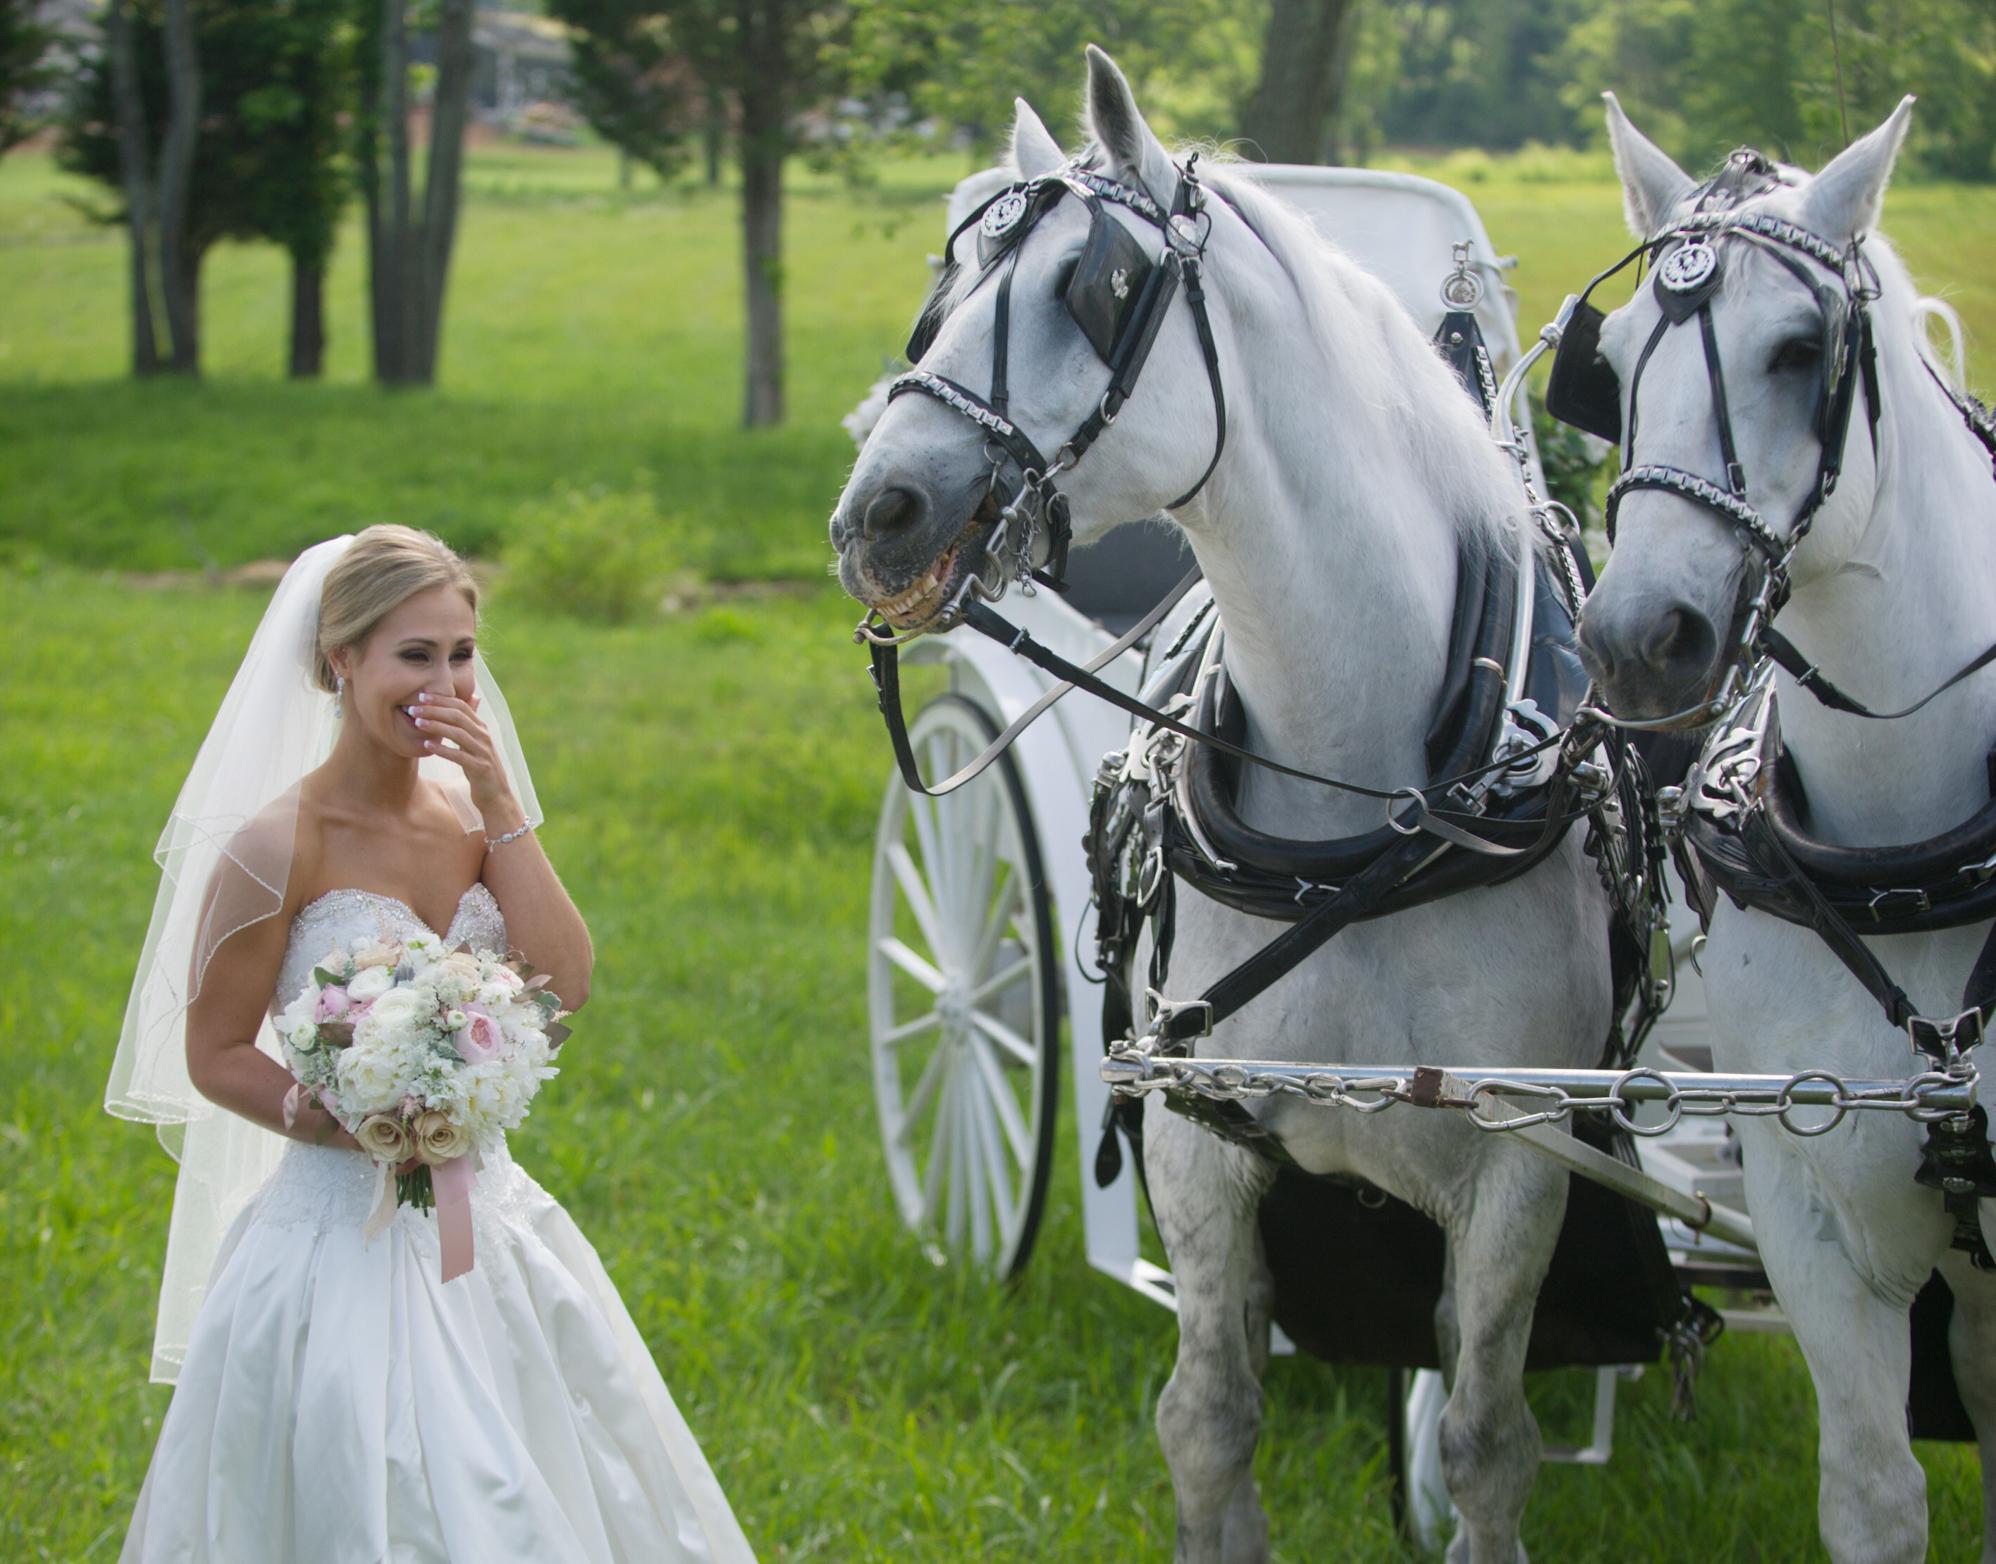 va-wedding-stonetower-winery-jax-photography-destination-wedding-portrait 9